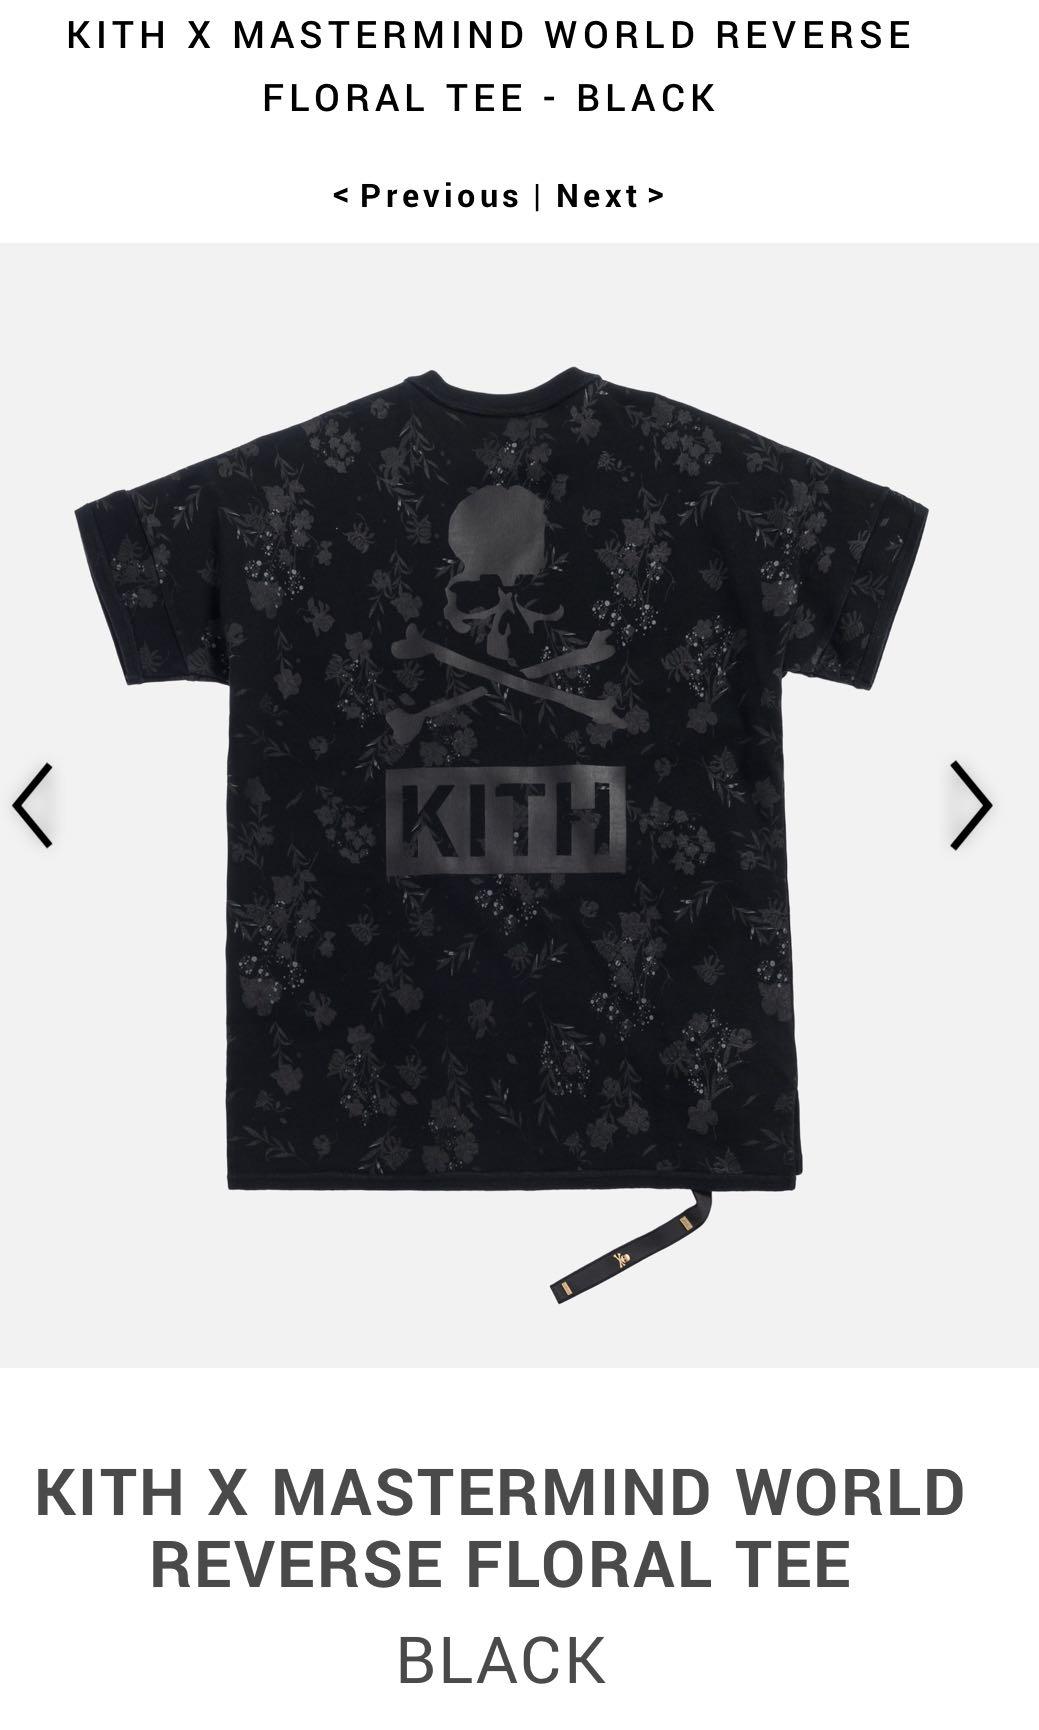 17d78d68f9b Kith X Mastermind World Reverse Floral Tee Black